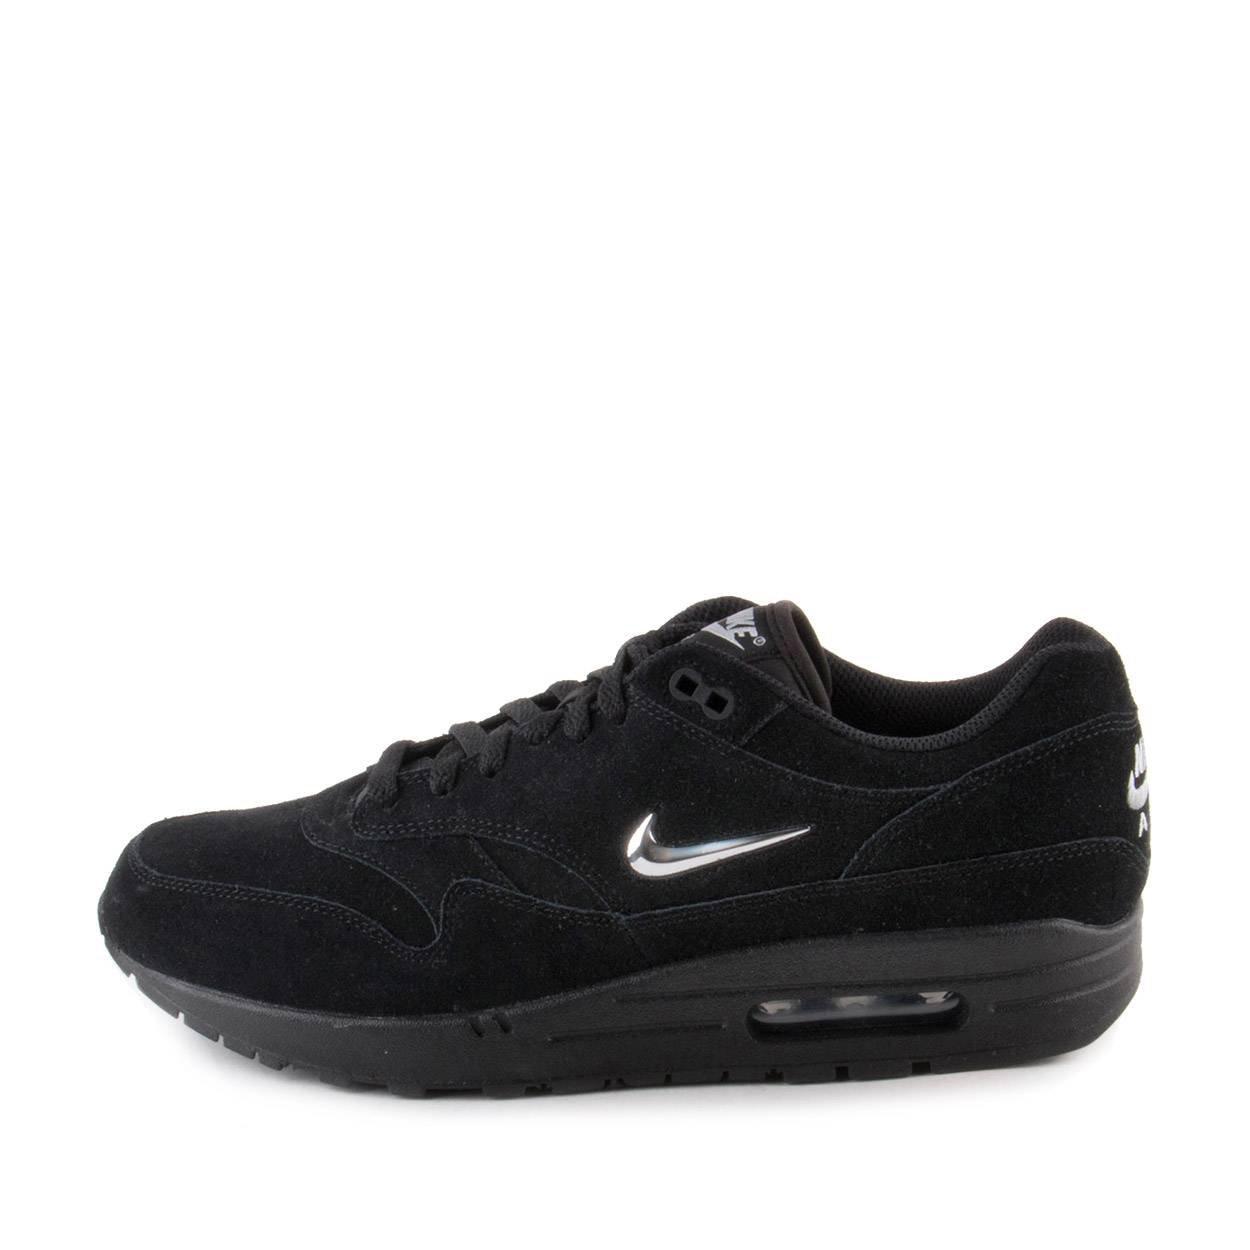 online retailer 59fea aa9b7 NIKE Mens Air Max 1 Premium Sc  Amazon.co.uk  Shoes   Bags